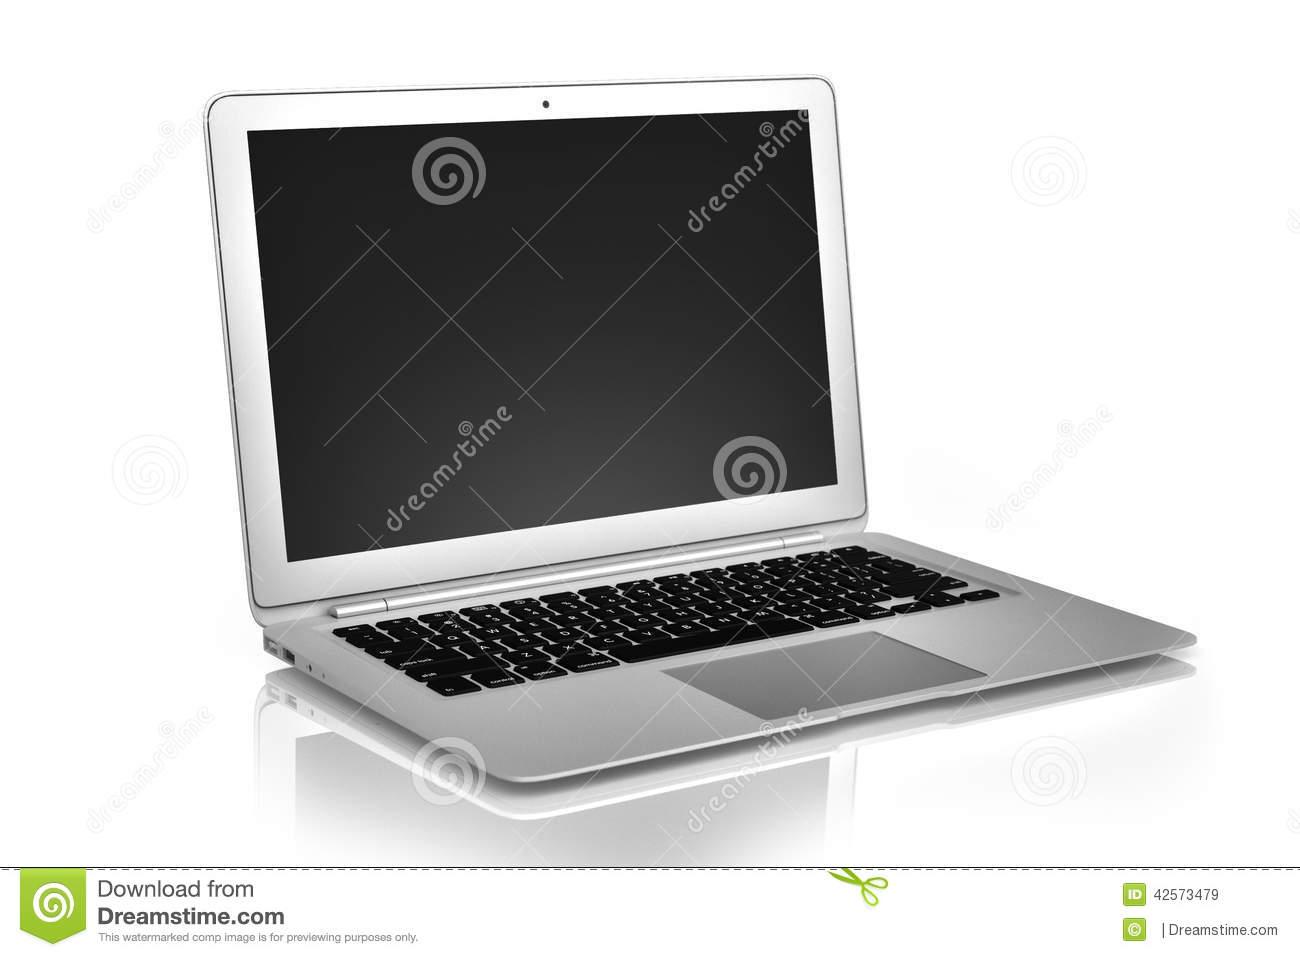 Macbook clipart Laptop Laptop Air Free Mac